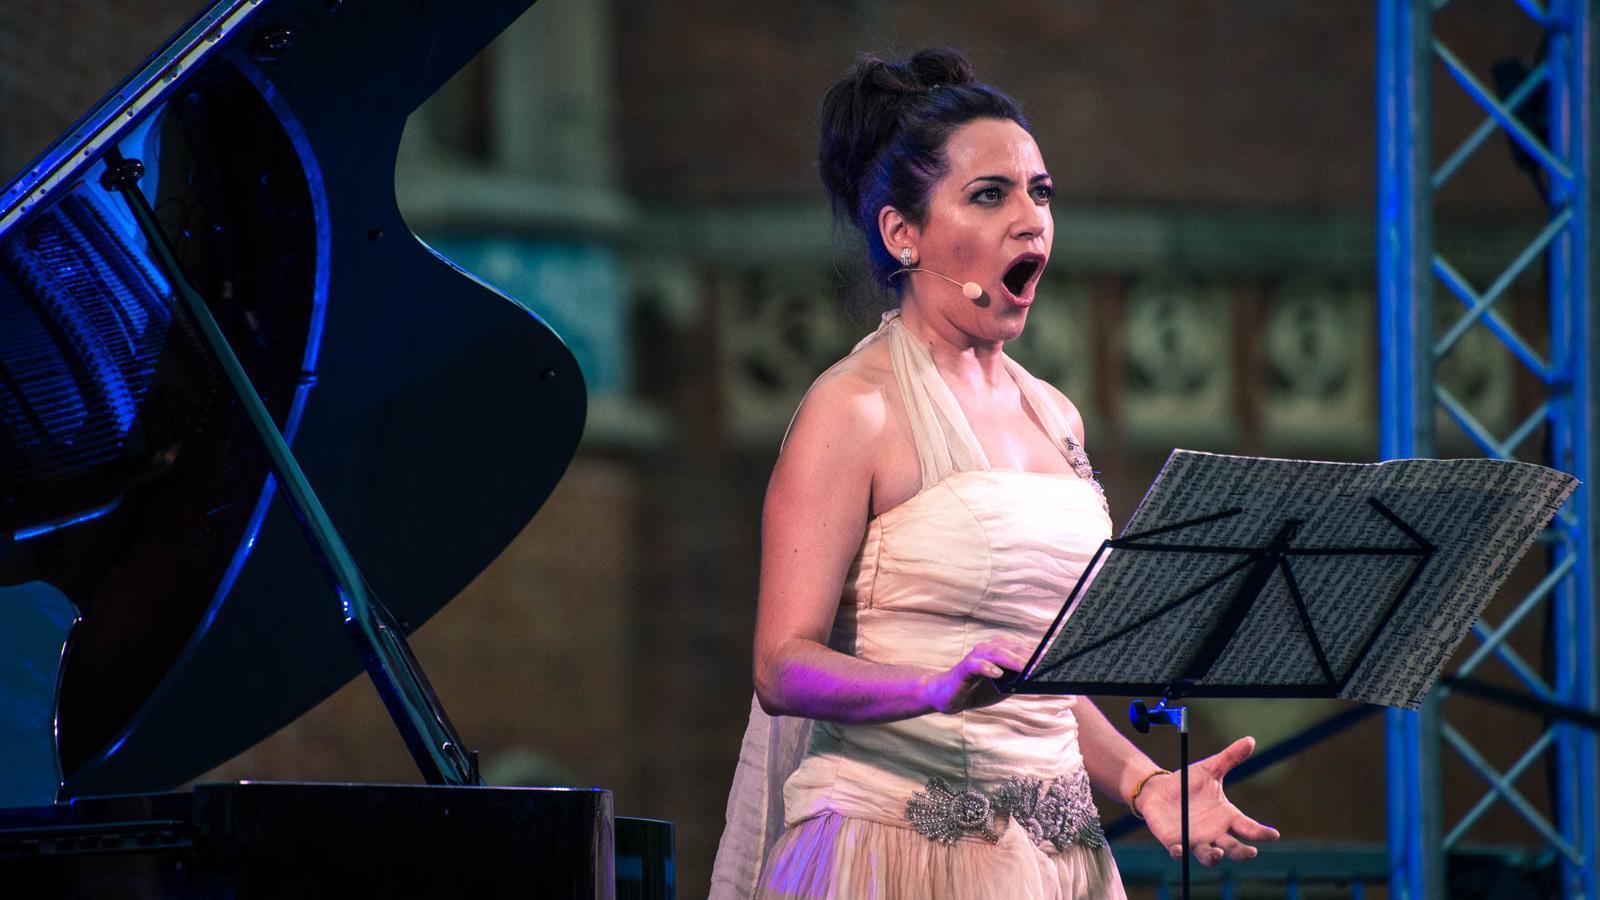 La mezzosoprano Anna Alàs durant el recital al Recinte Modernista de Sant Pau